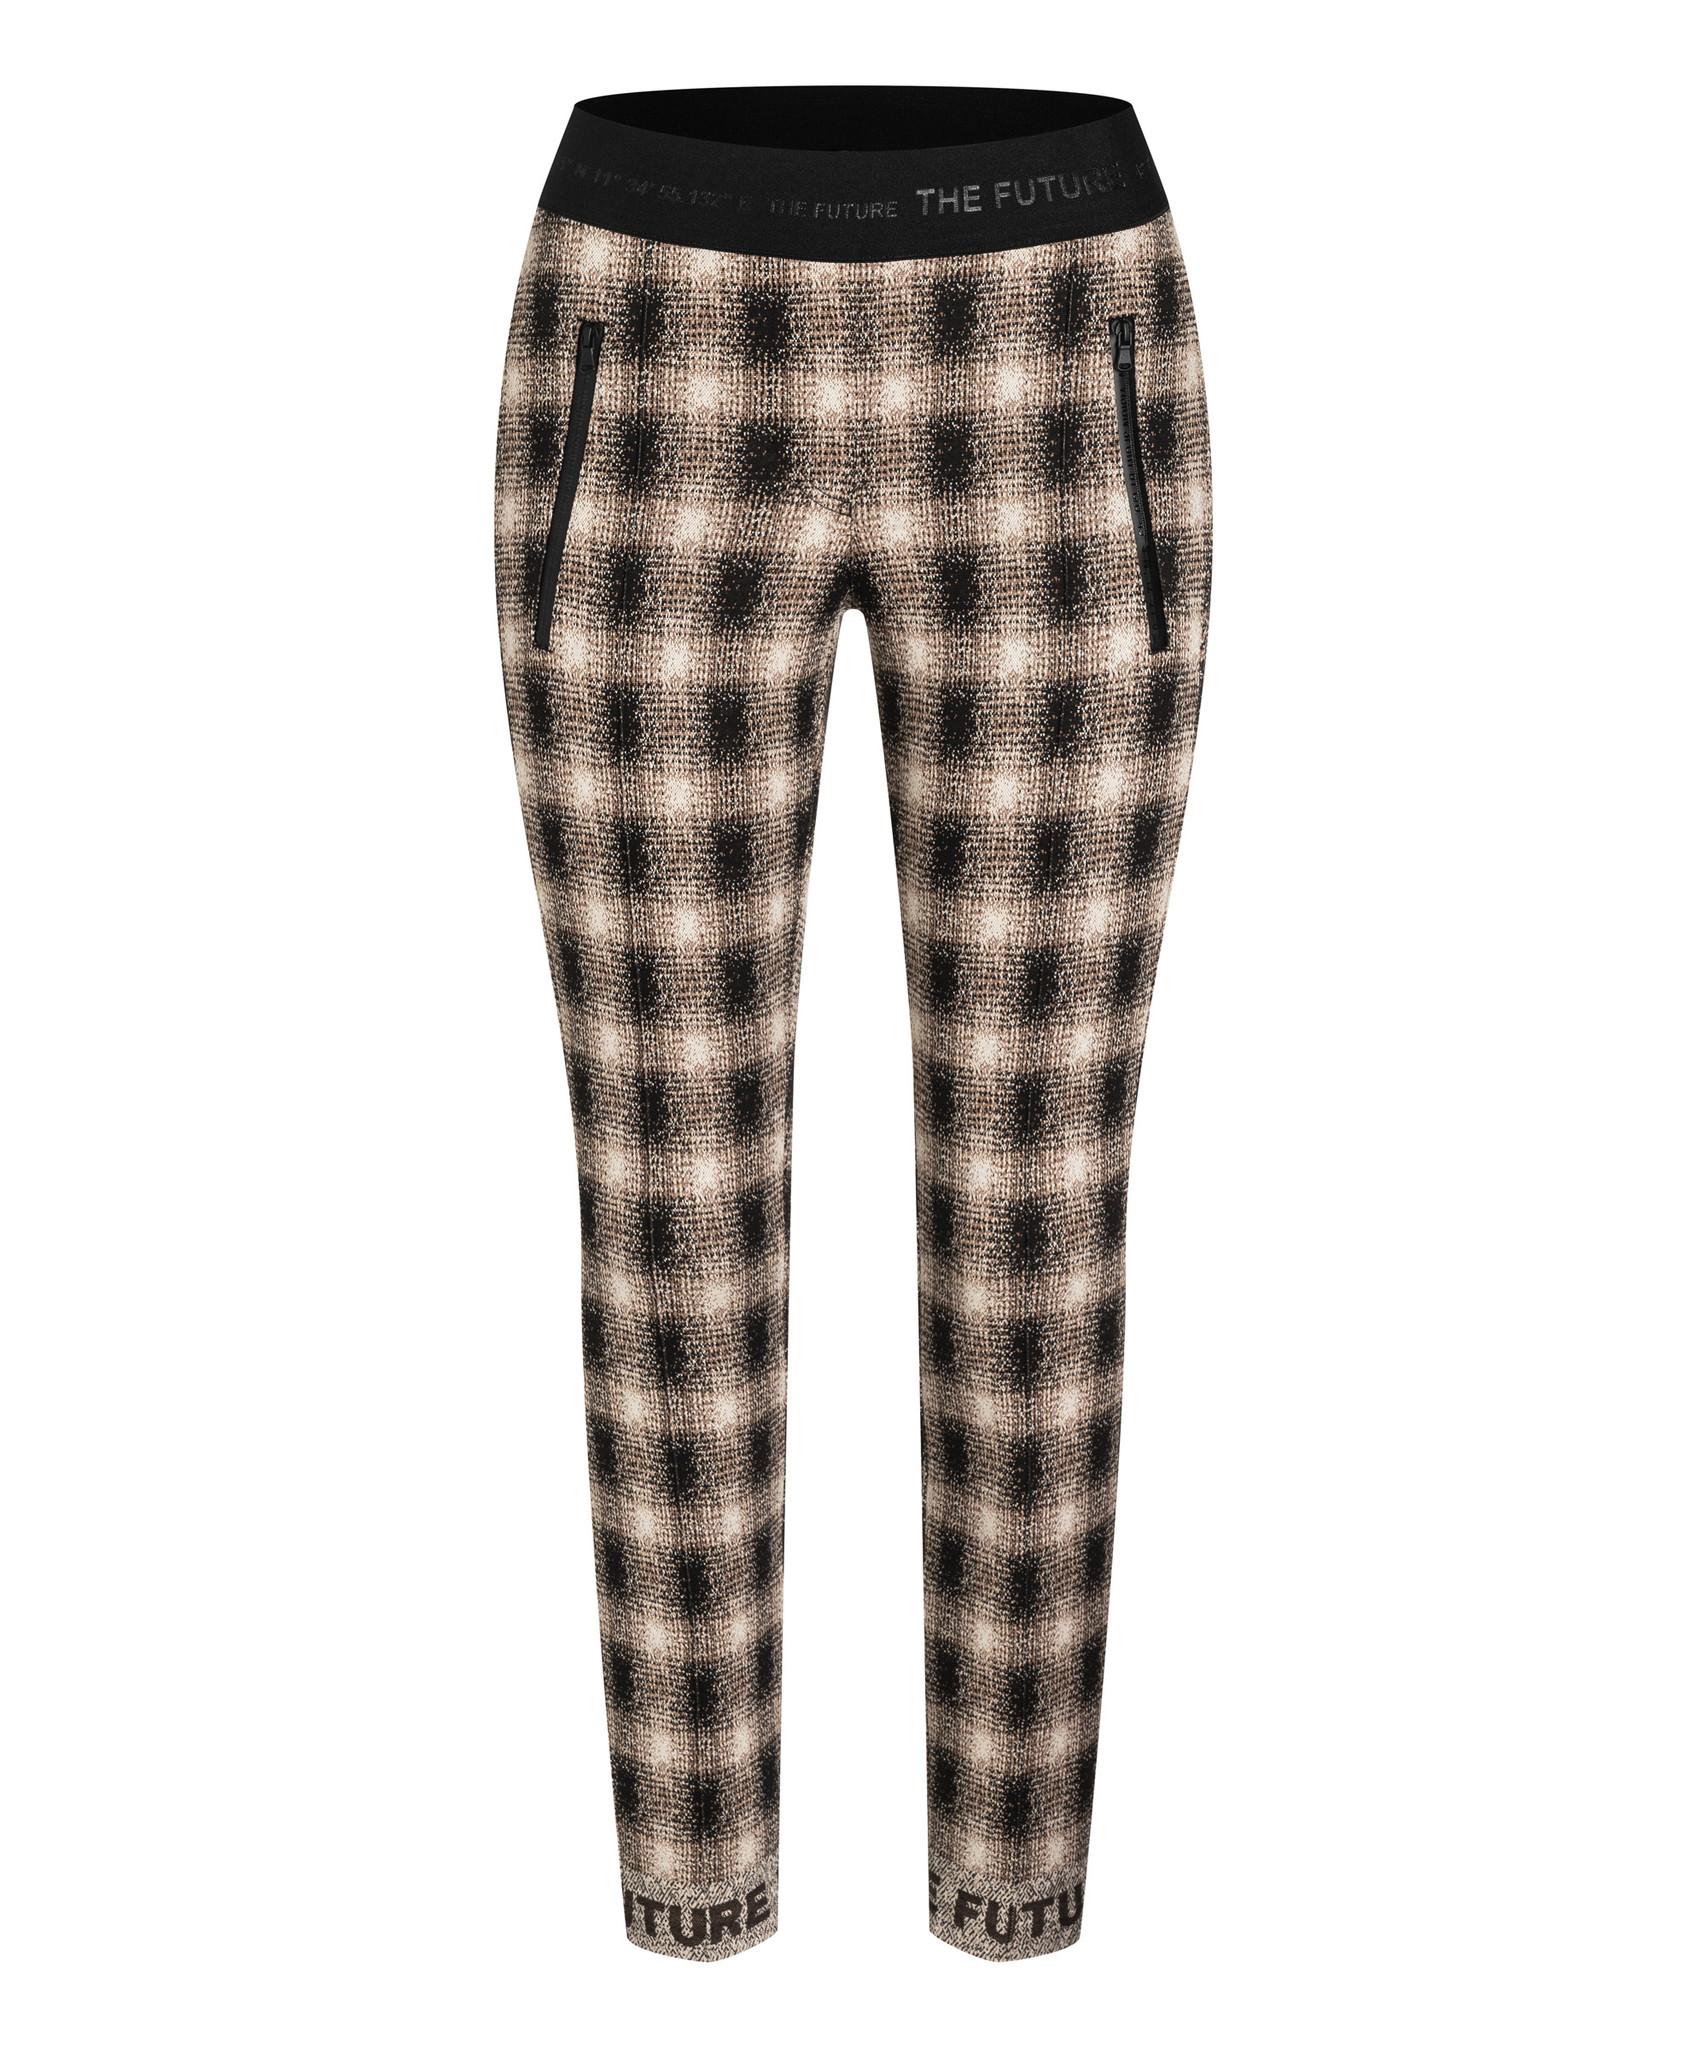 Cambio trousers RANEE 6717-1